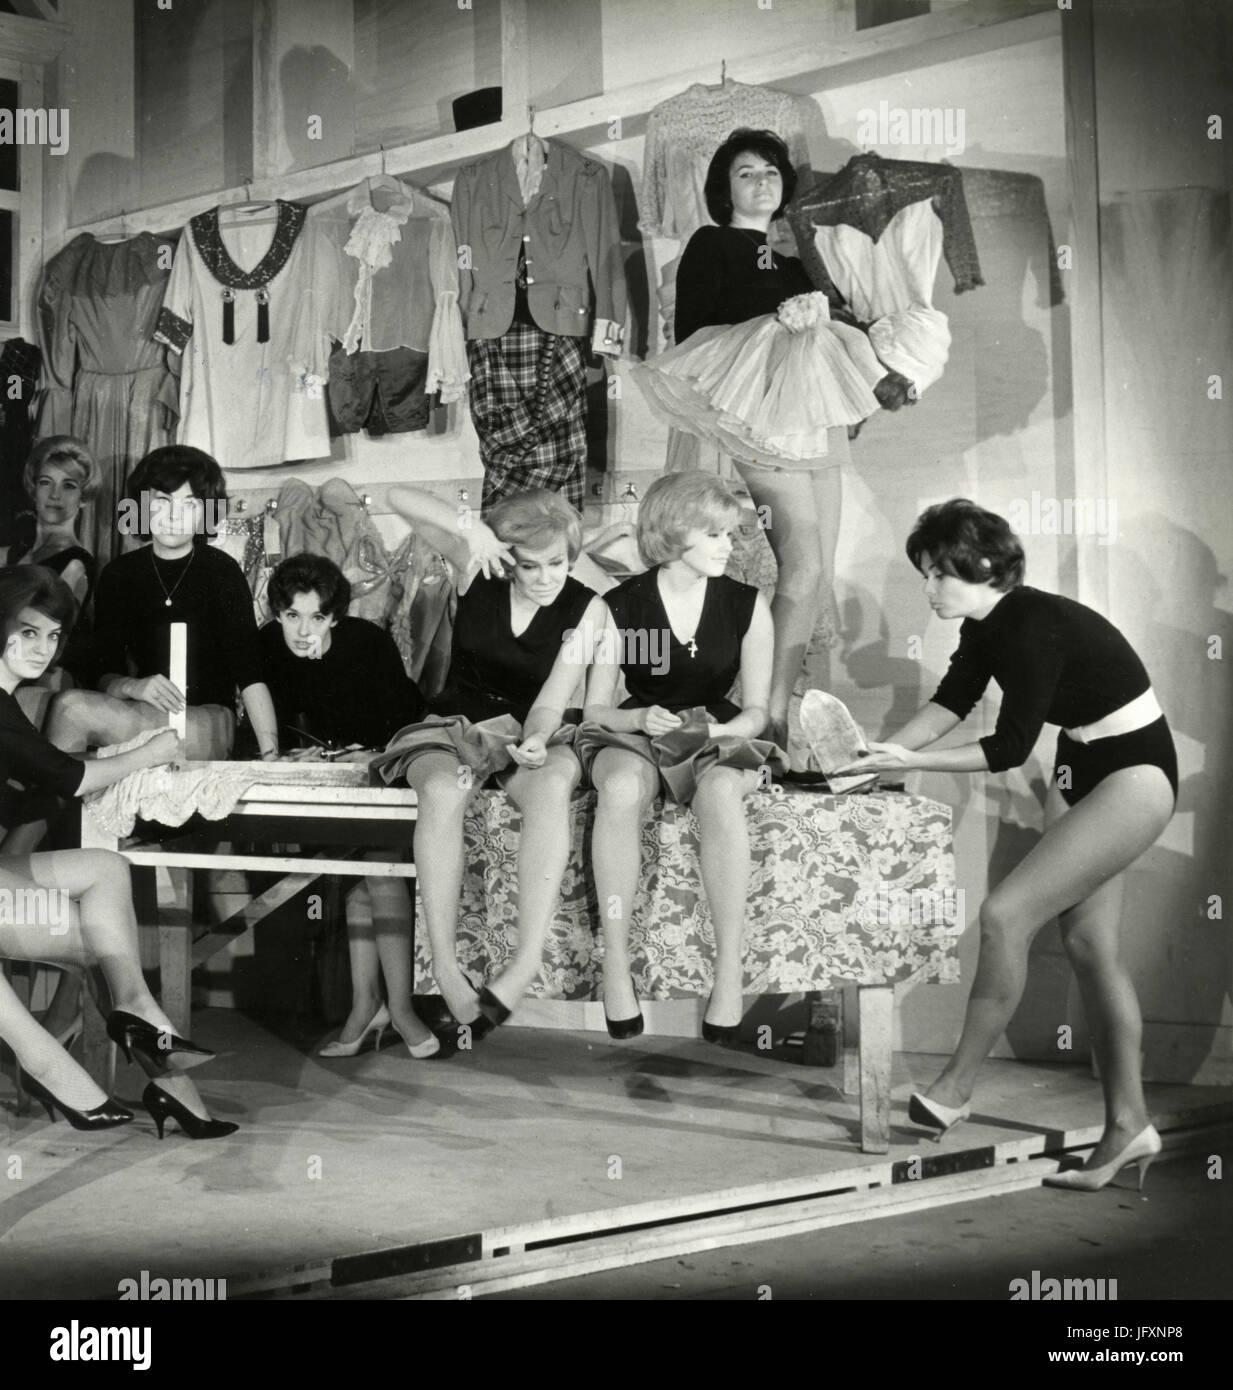 Girls' troupe during reharsal, October 1960 - Stock Image